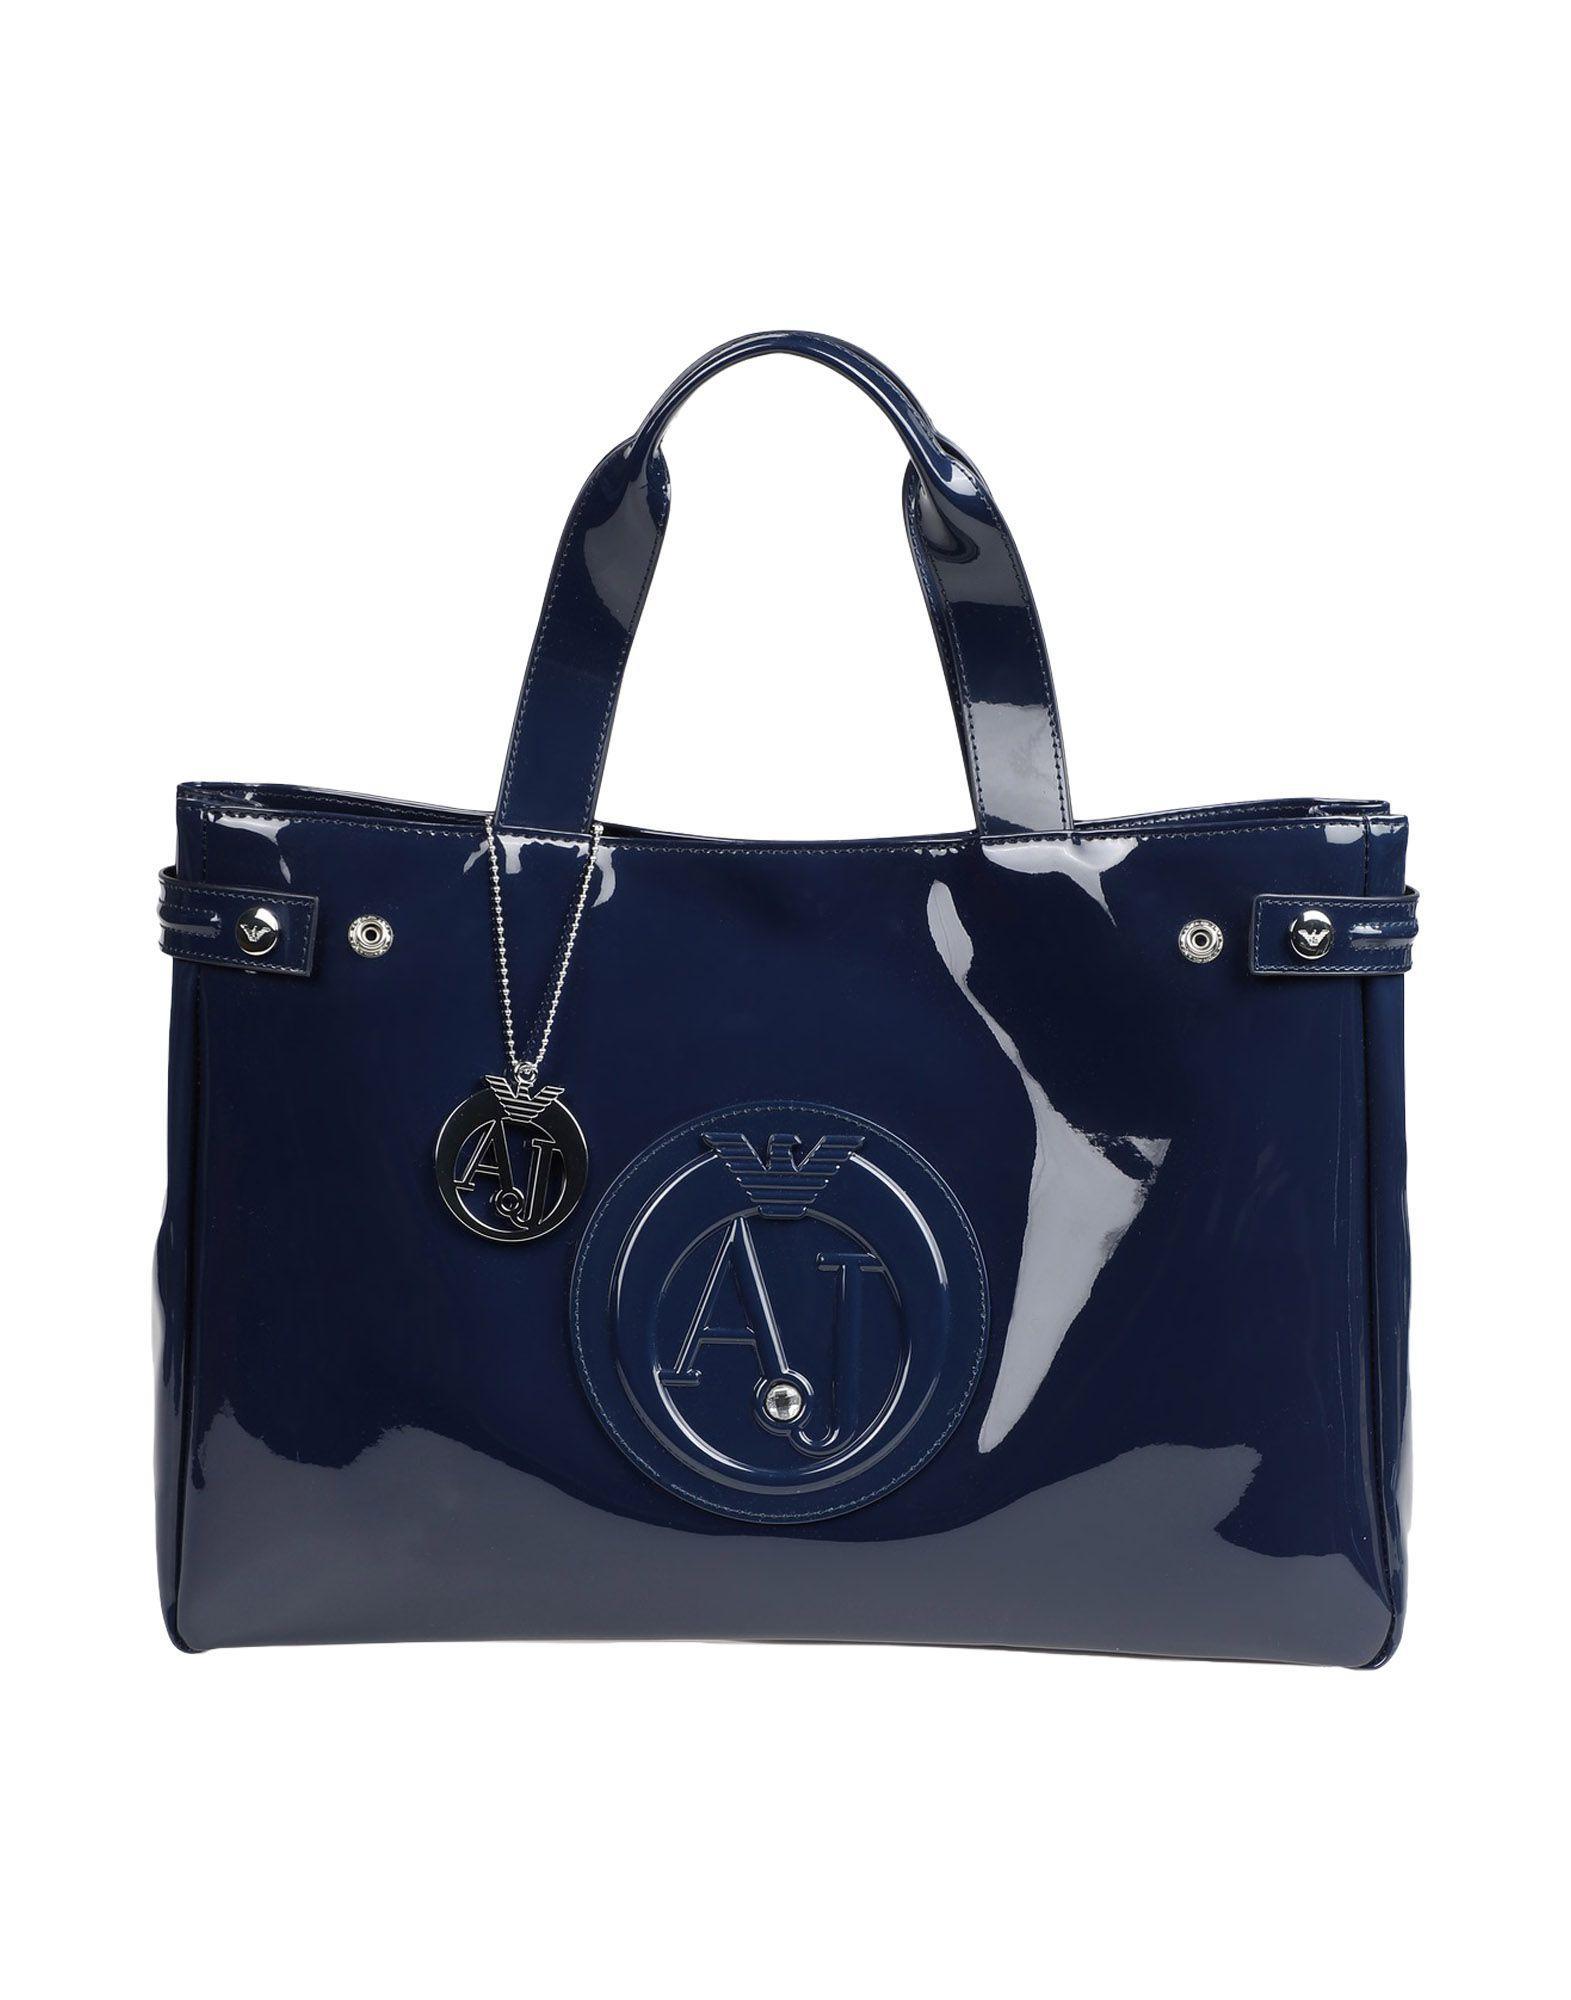 Armani Jeans Handbags In Dark Blue